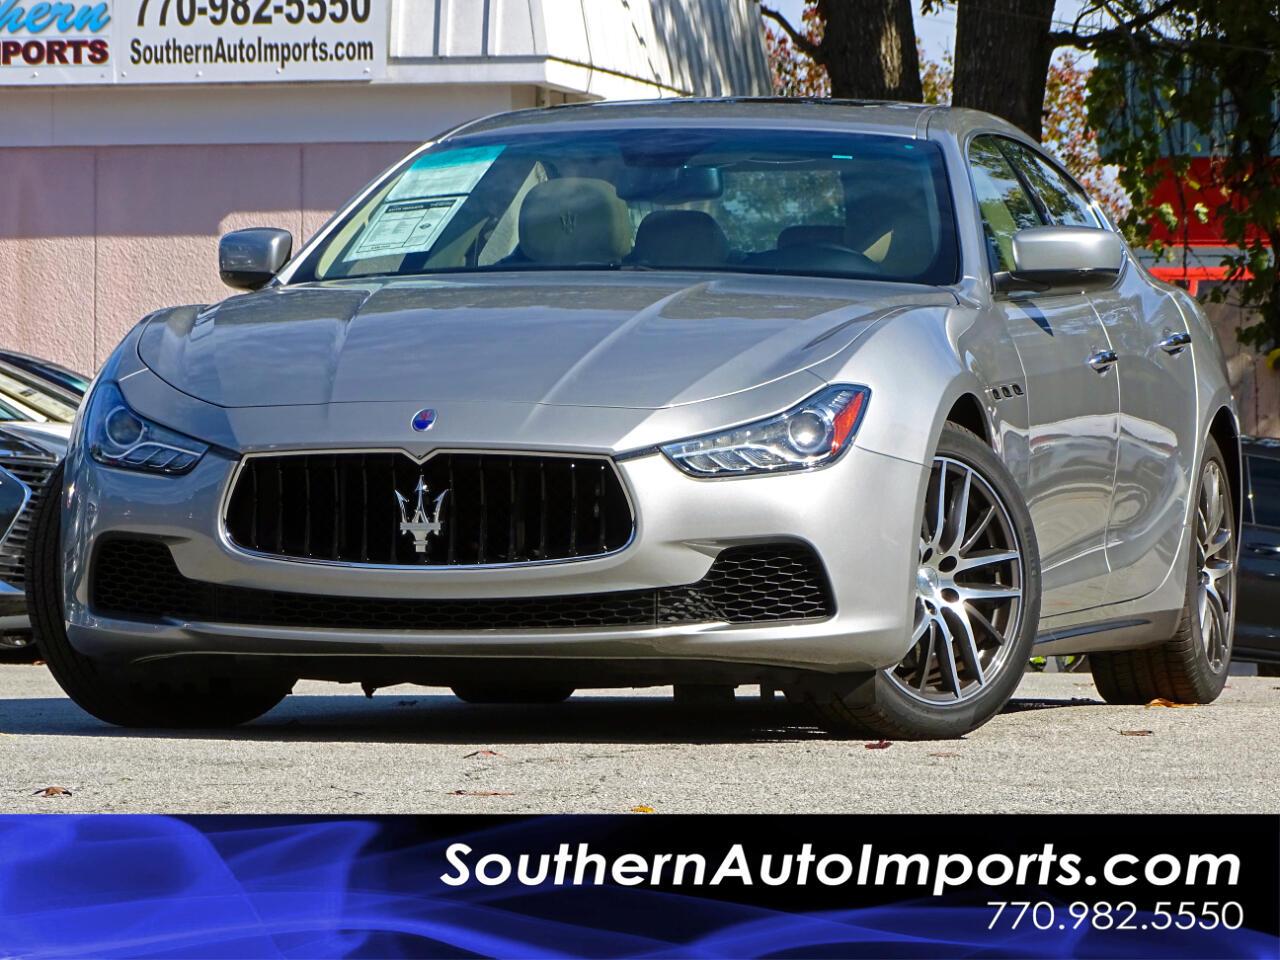 2015 Maserati Ghibli Sport Wheels Navigation 1owner